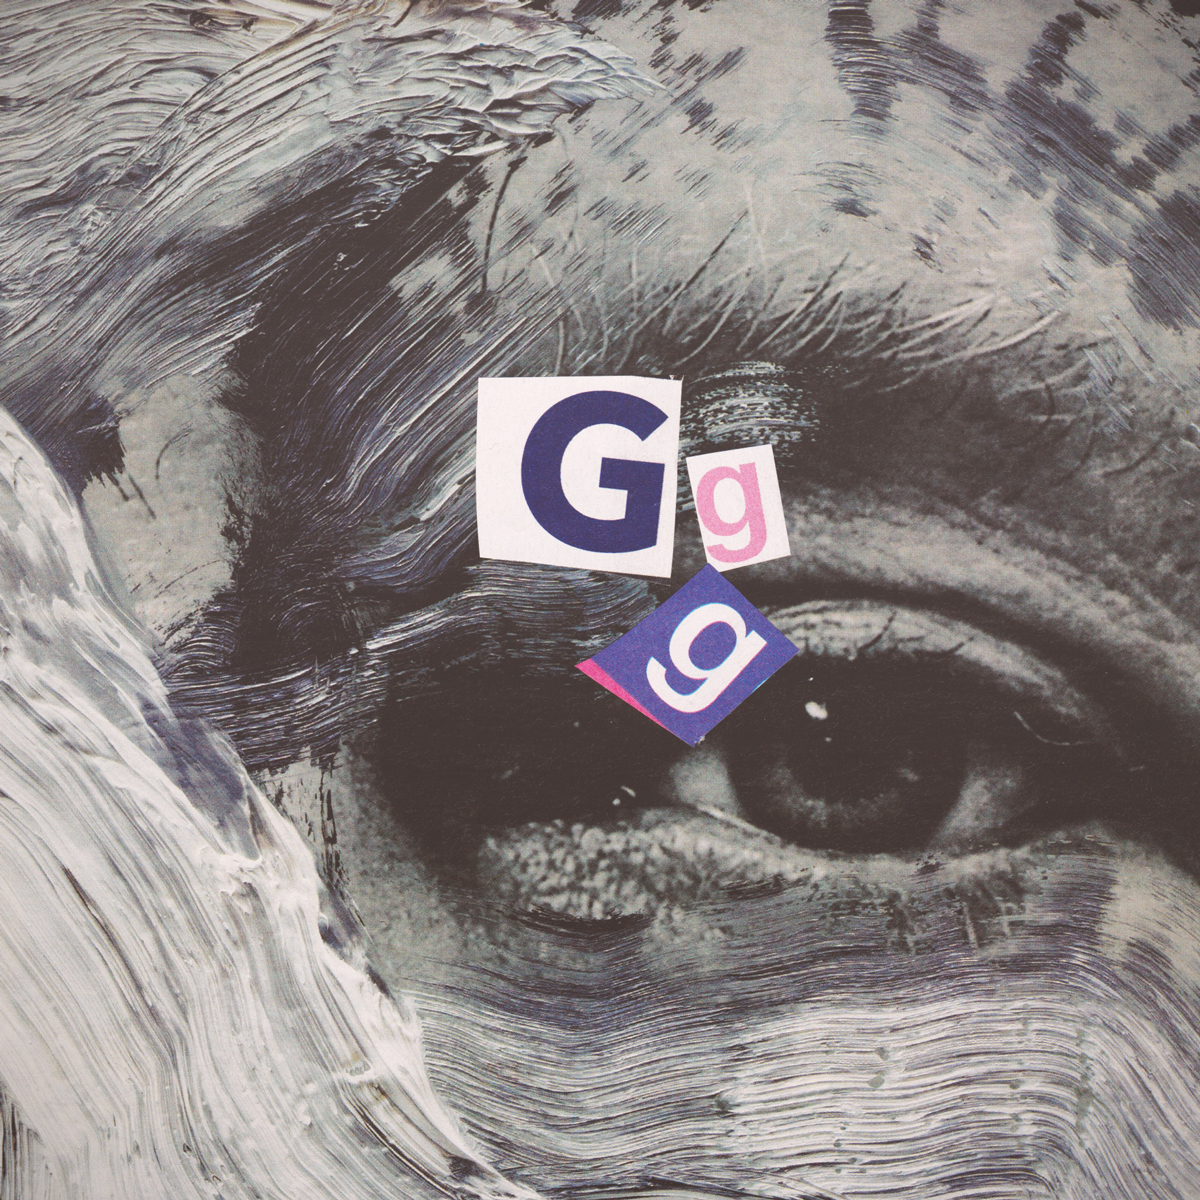 g_.jpg